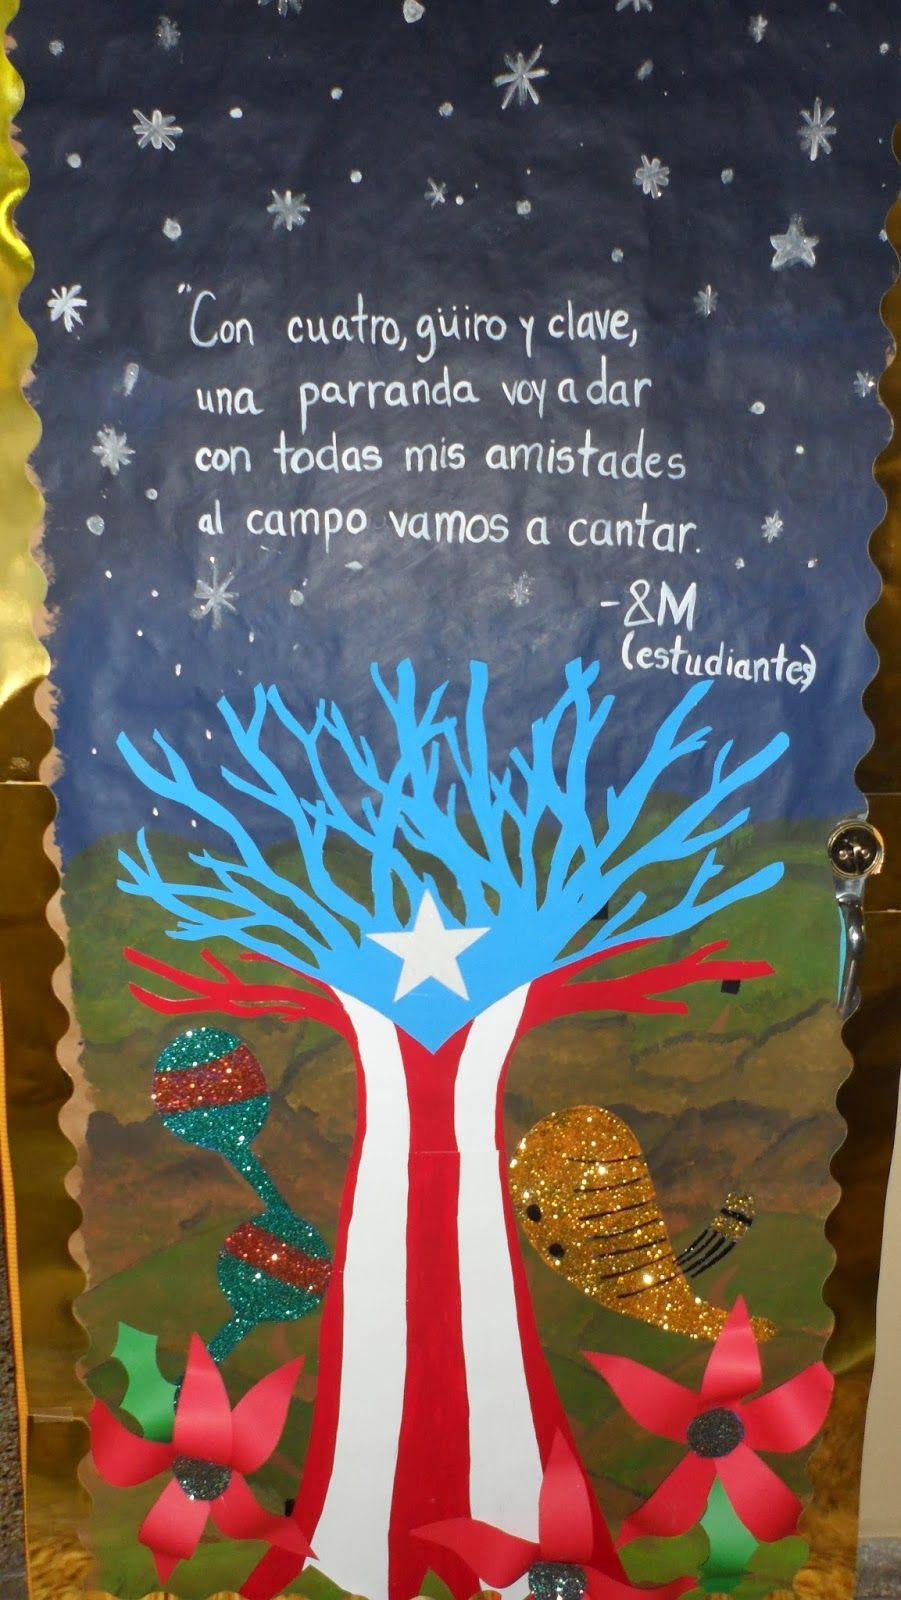 Puertorriqueñidad | ideas | Pinterest | Caribbean